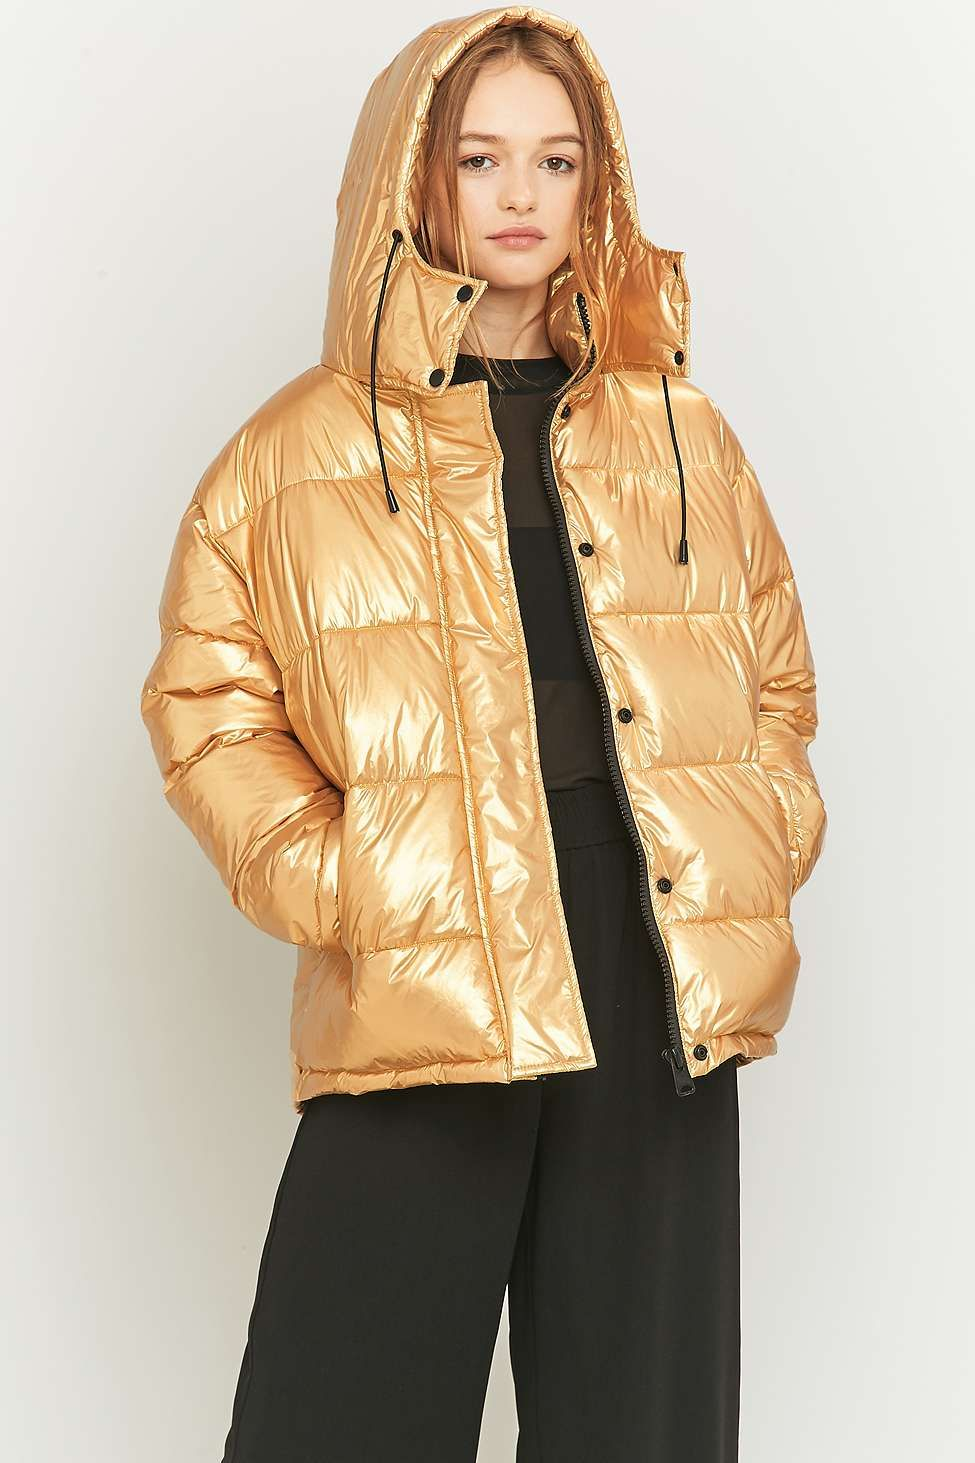 Shop Light Before Dark Metallic Gold Puffer Jacket In 2021 Metallic Bomber Jacket Clothes Design Jackets [ 1463 x 975 Pixel ]